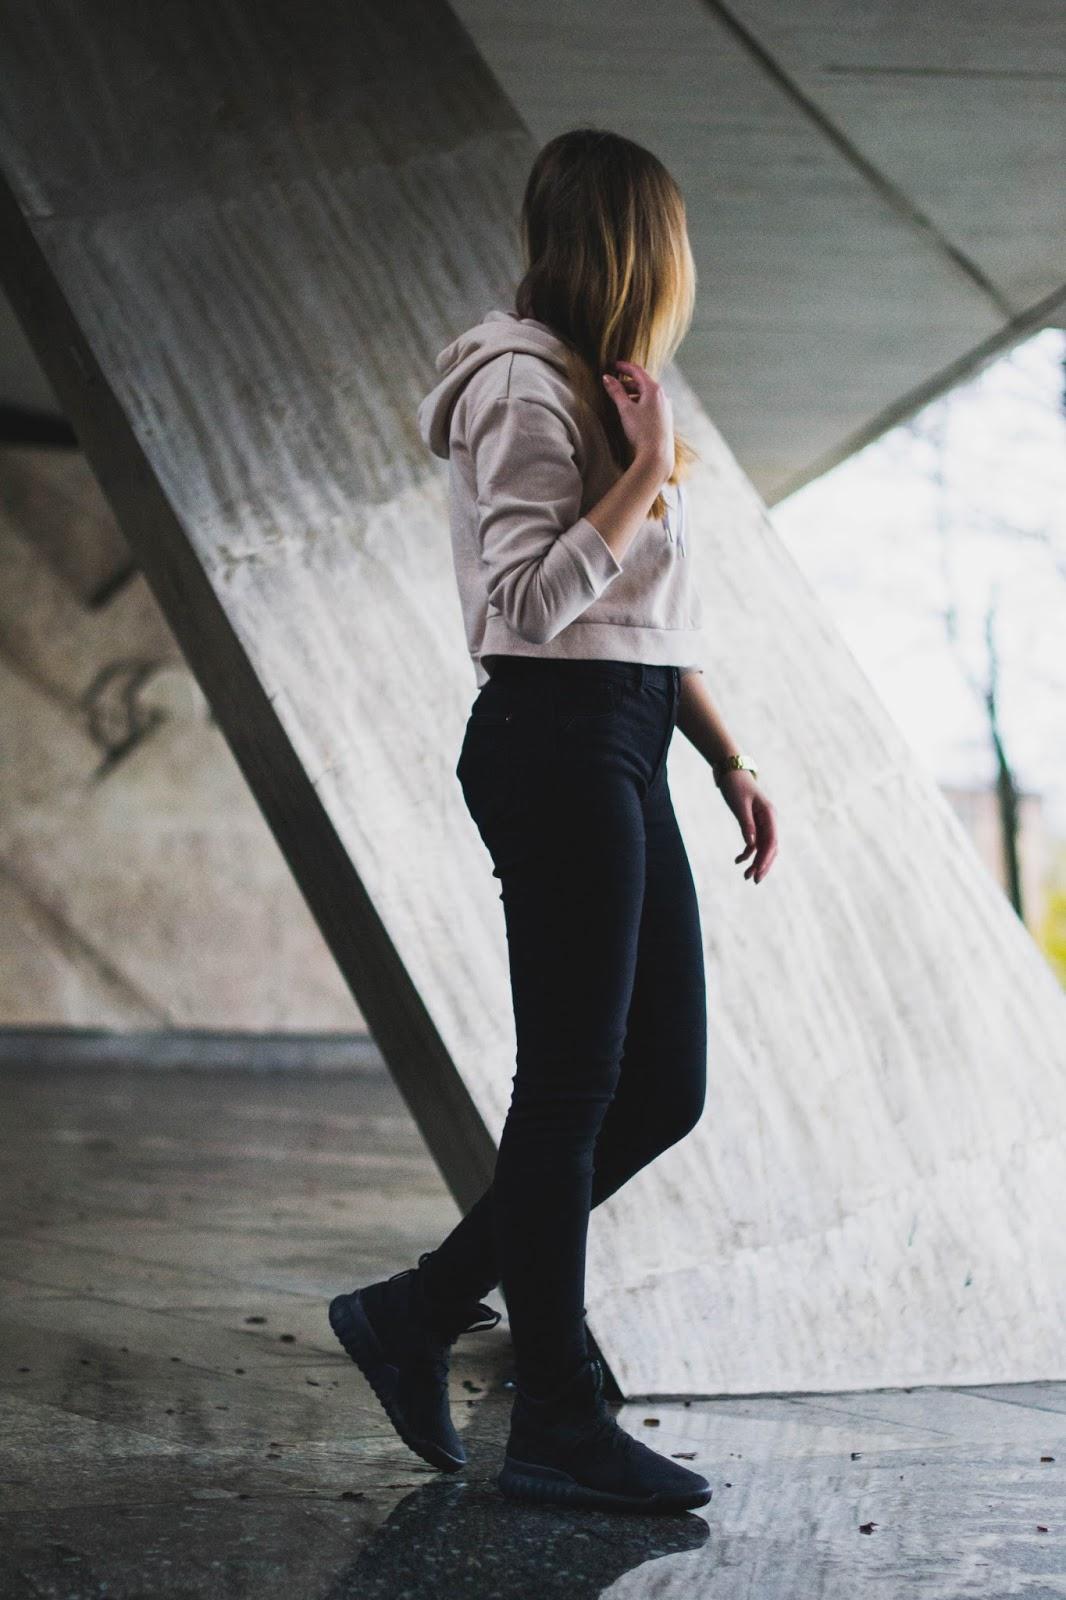 Adidas Tubular X PK        |         Kowalska Kinga